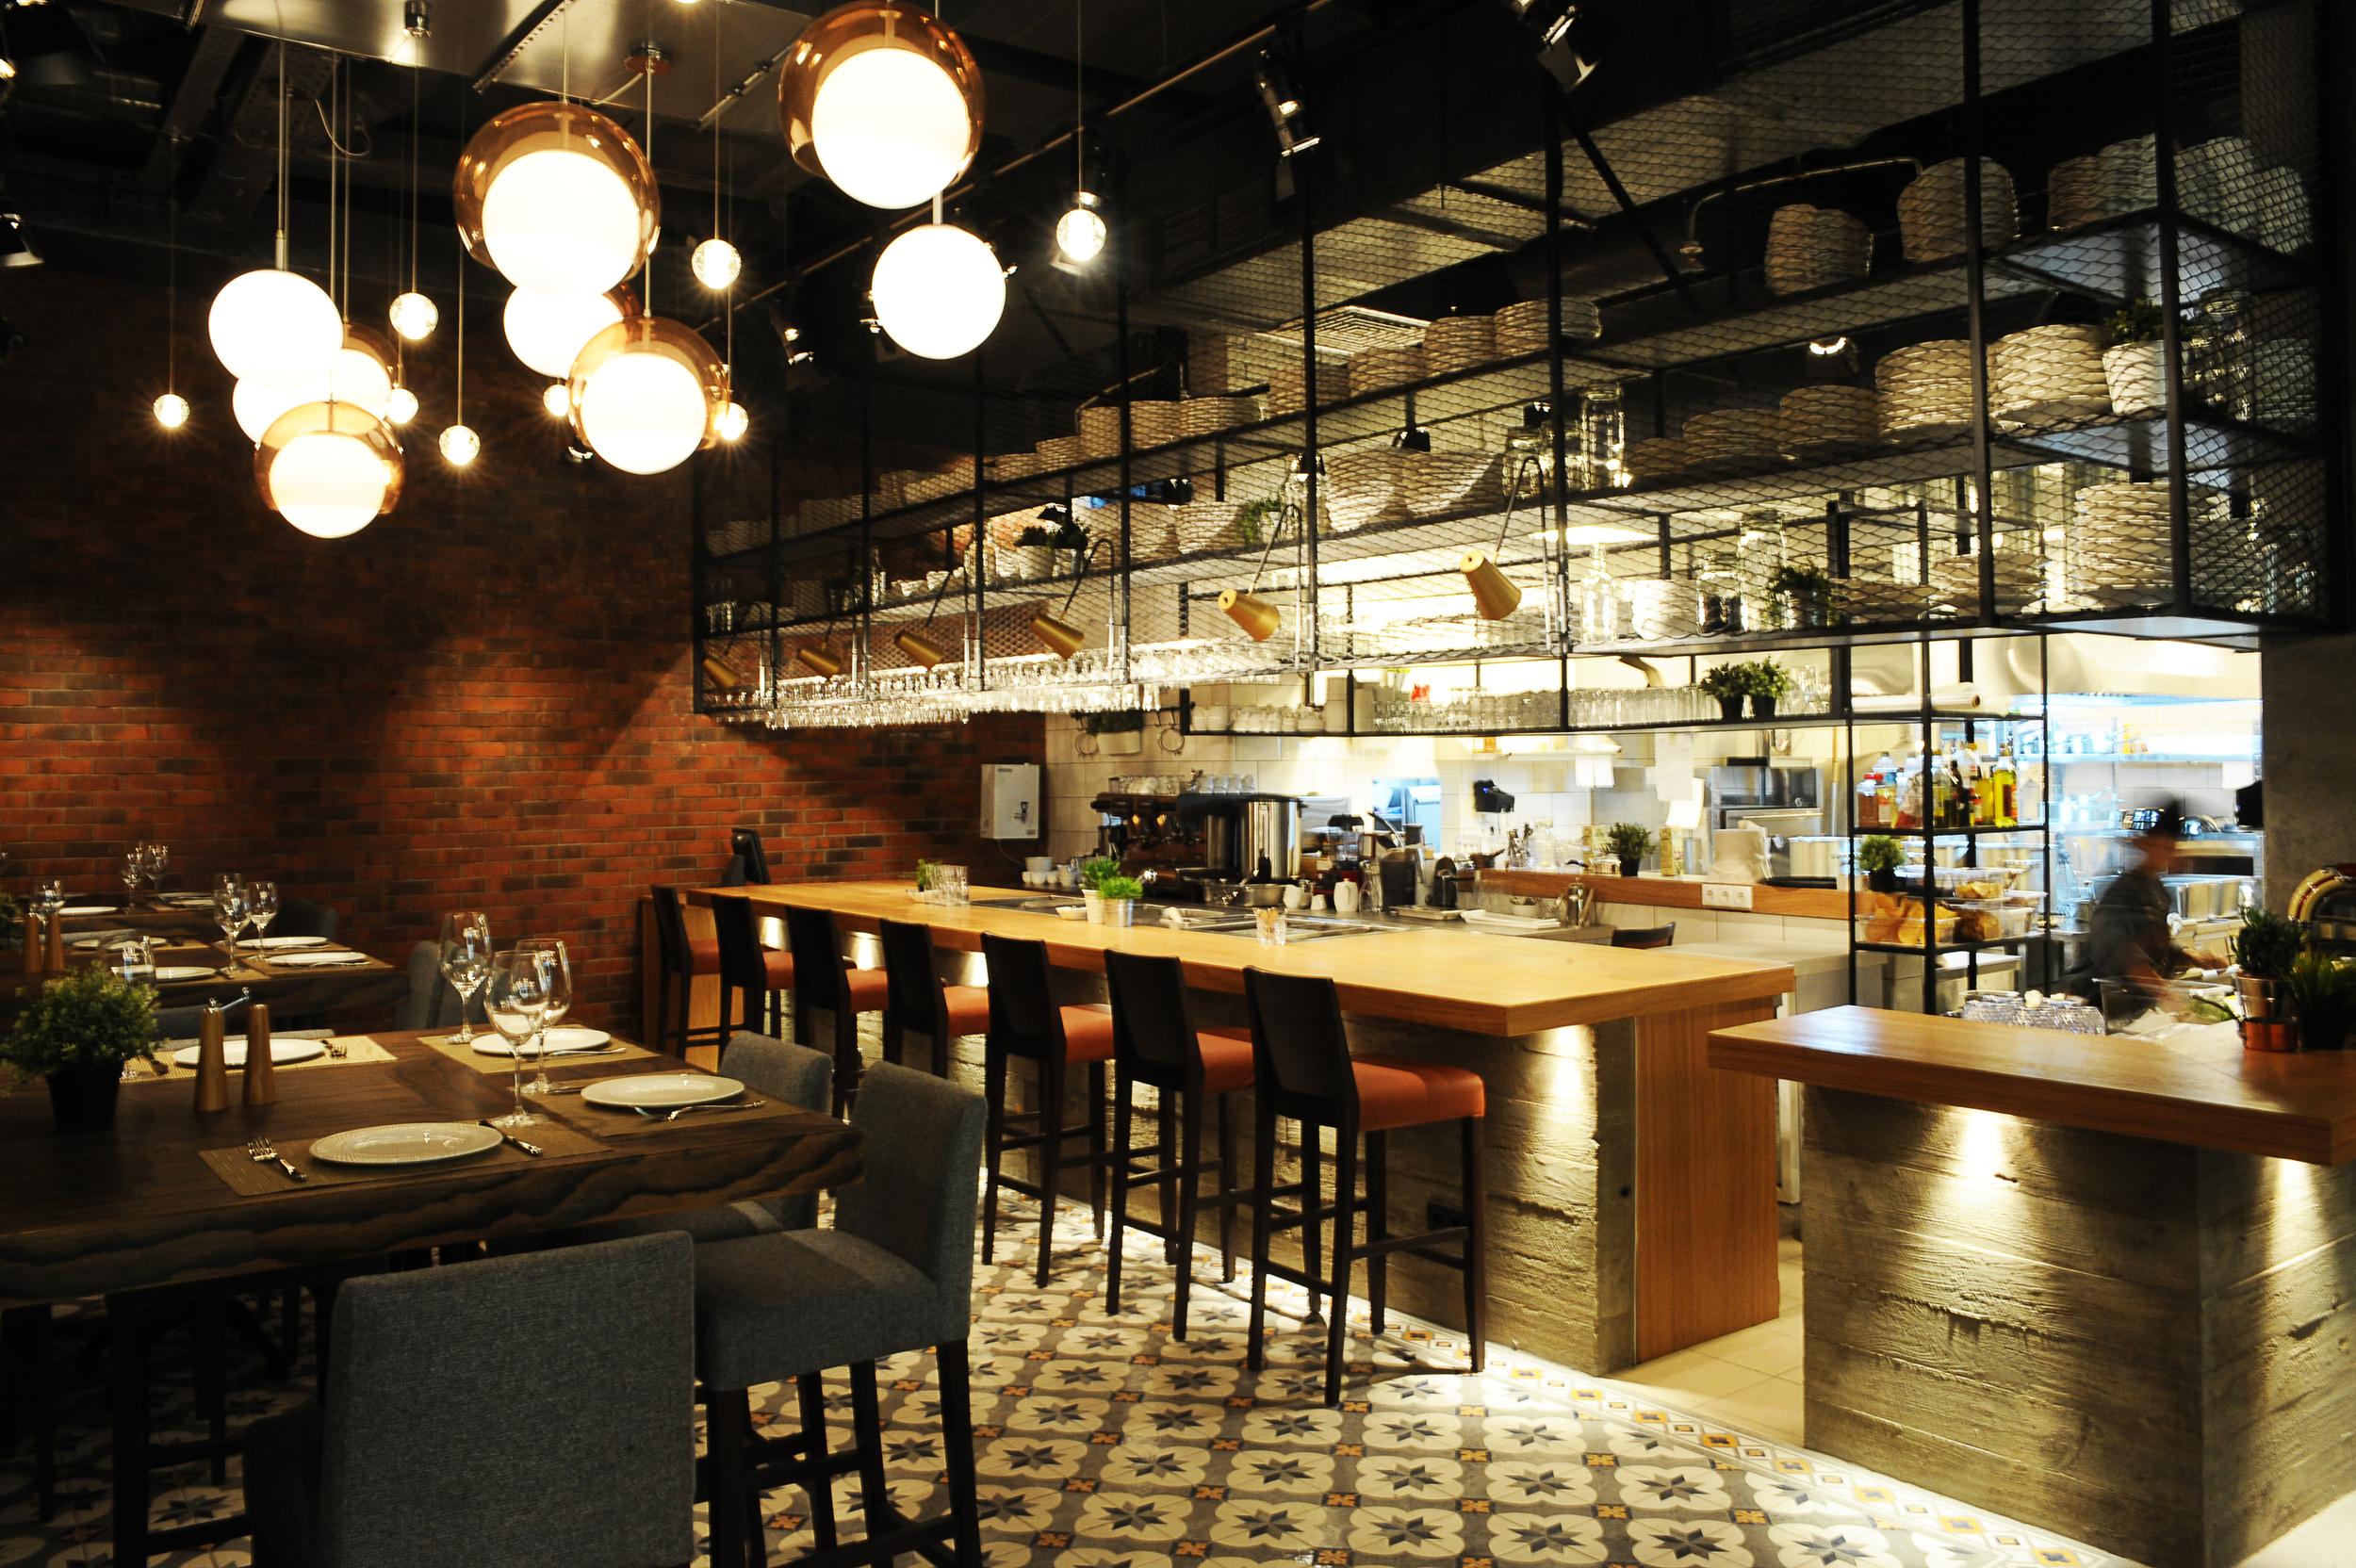 06_Match Architects_Friendly restaurant.jpg